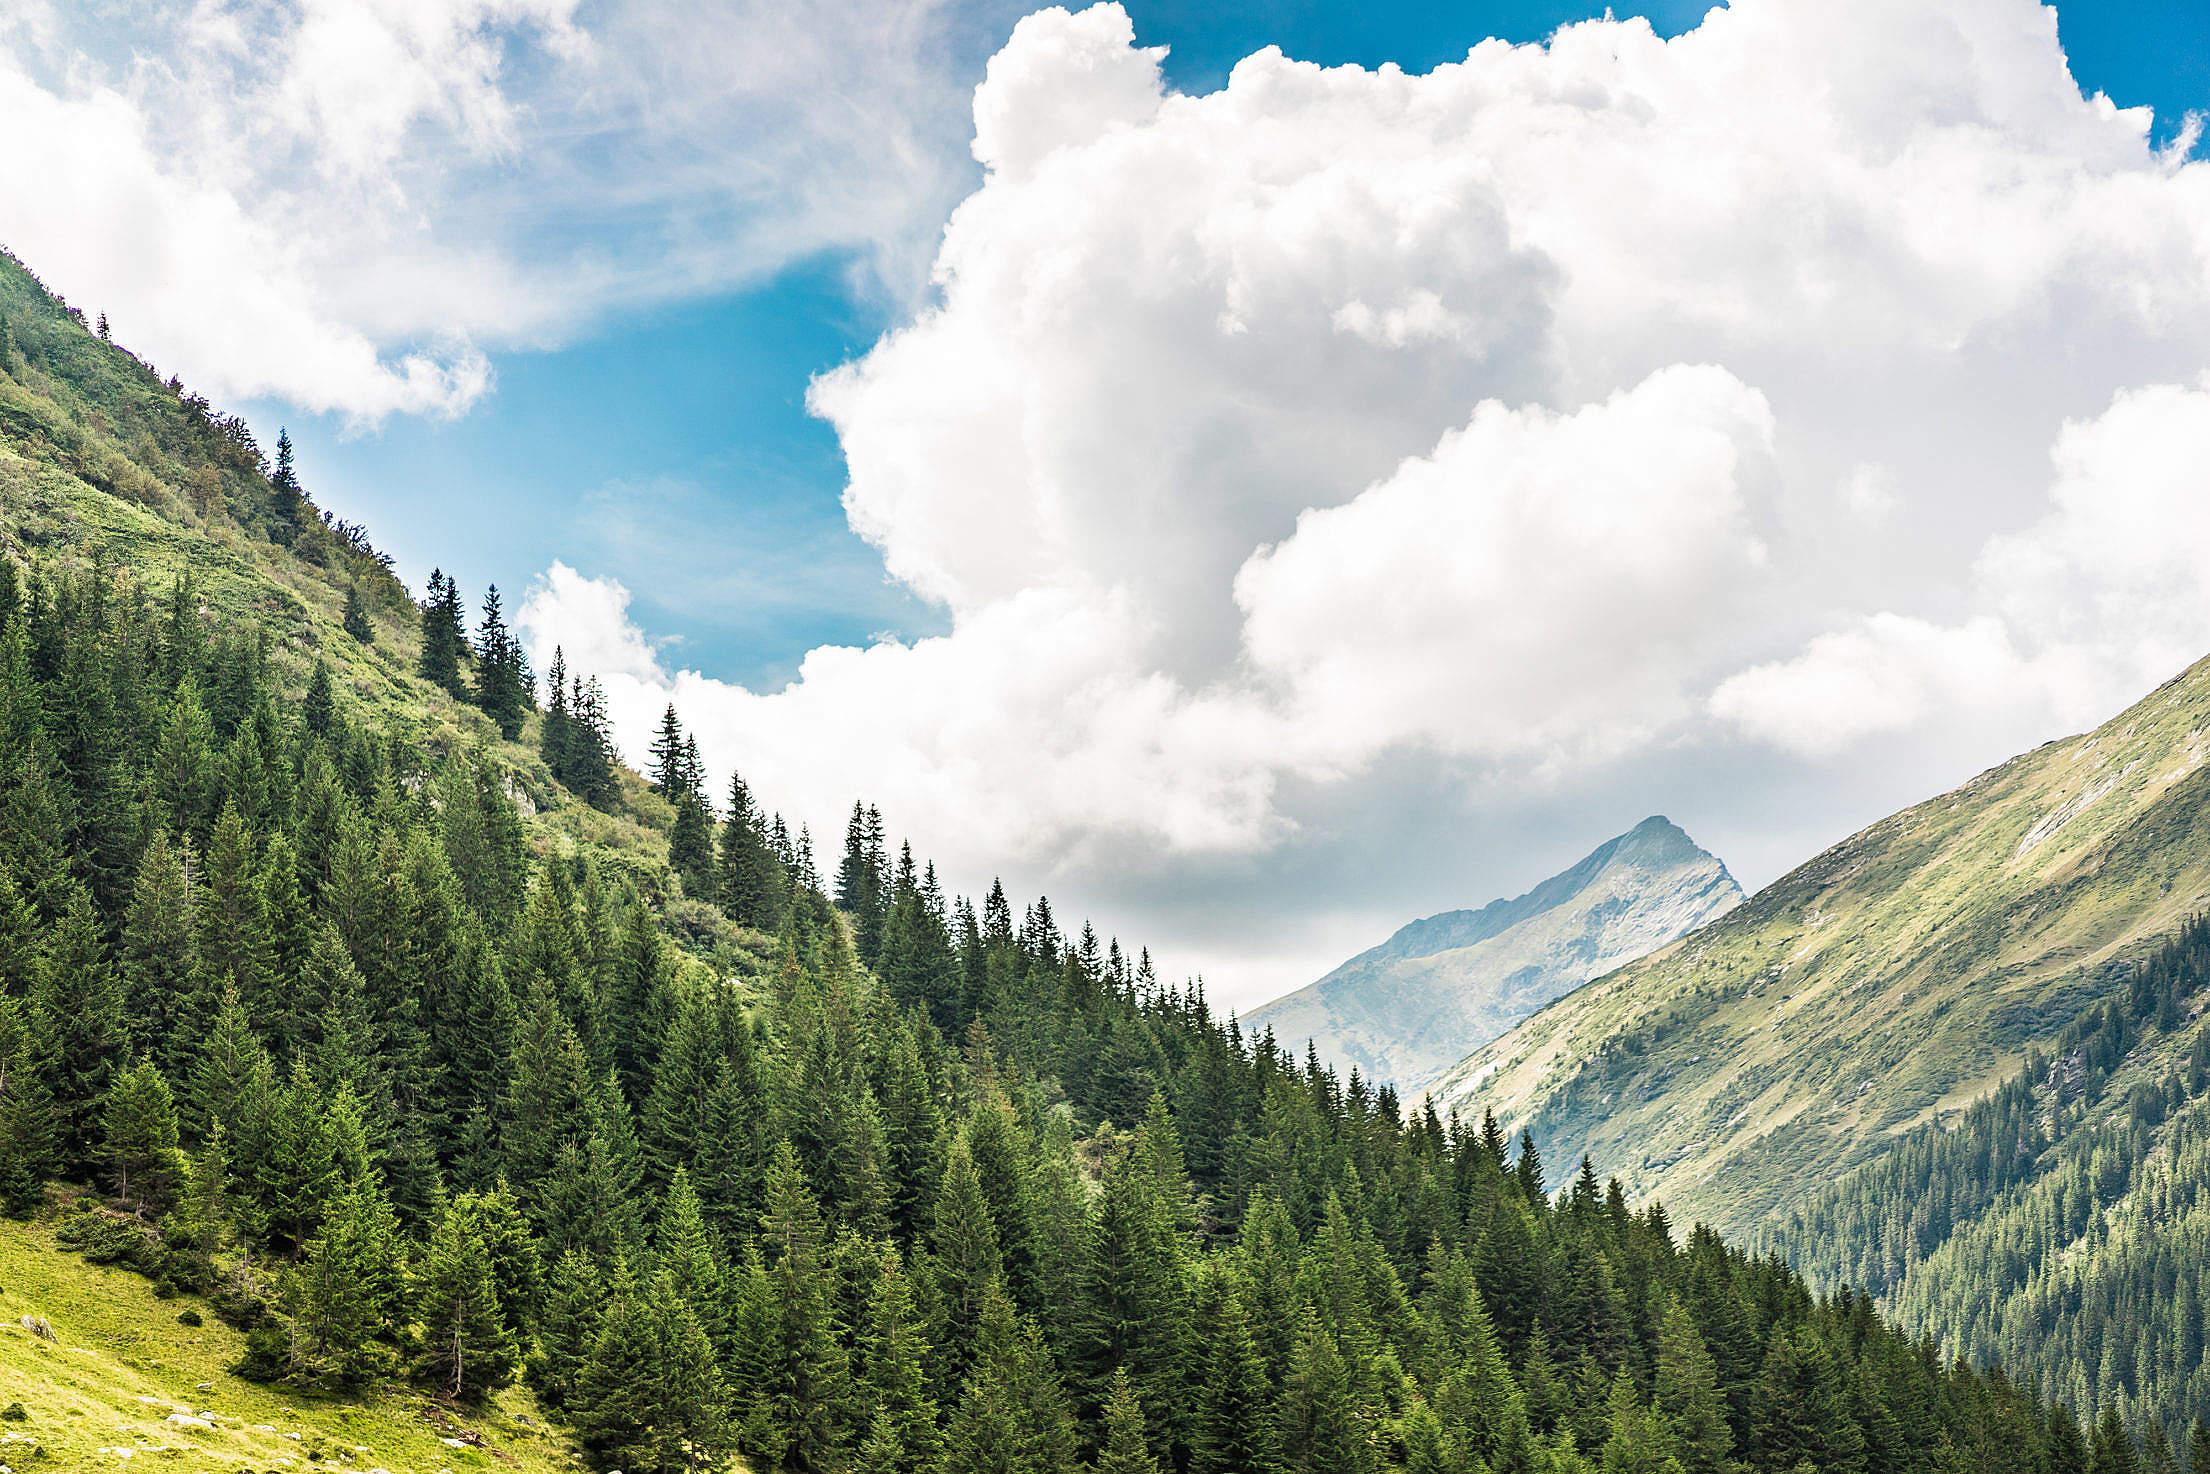 Beautiful Nature in Romanian Mountains Free Stock Photo